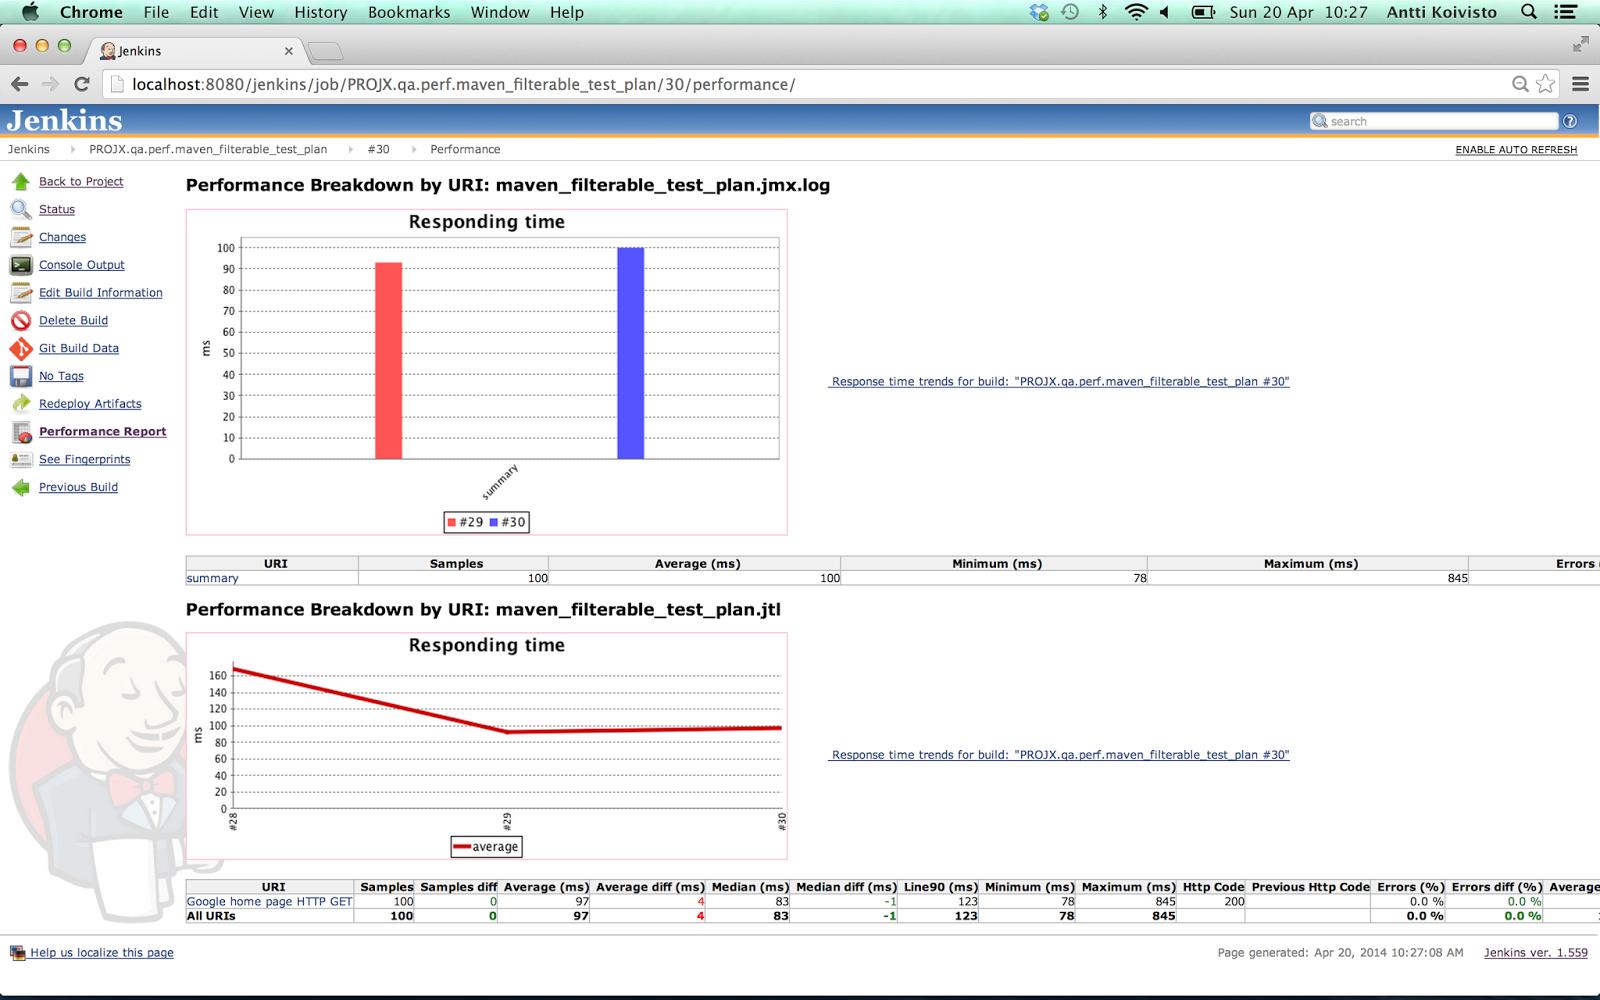 Single Page Information Radiator App for Jenkins   Antti